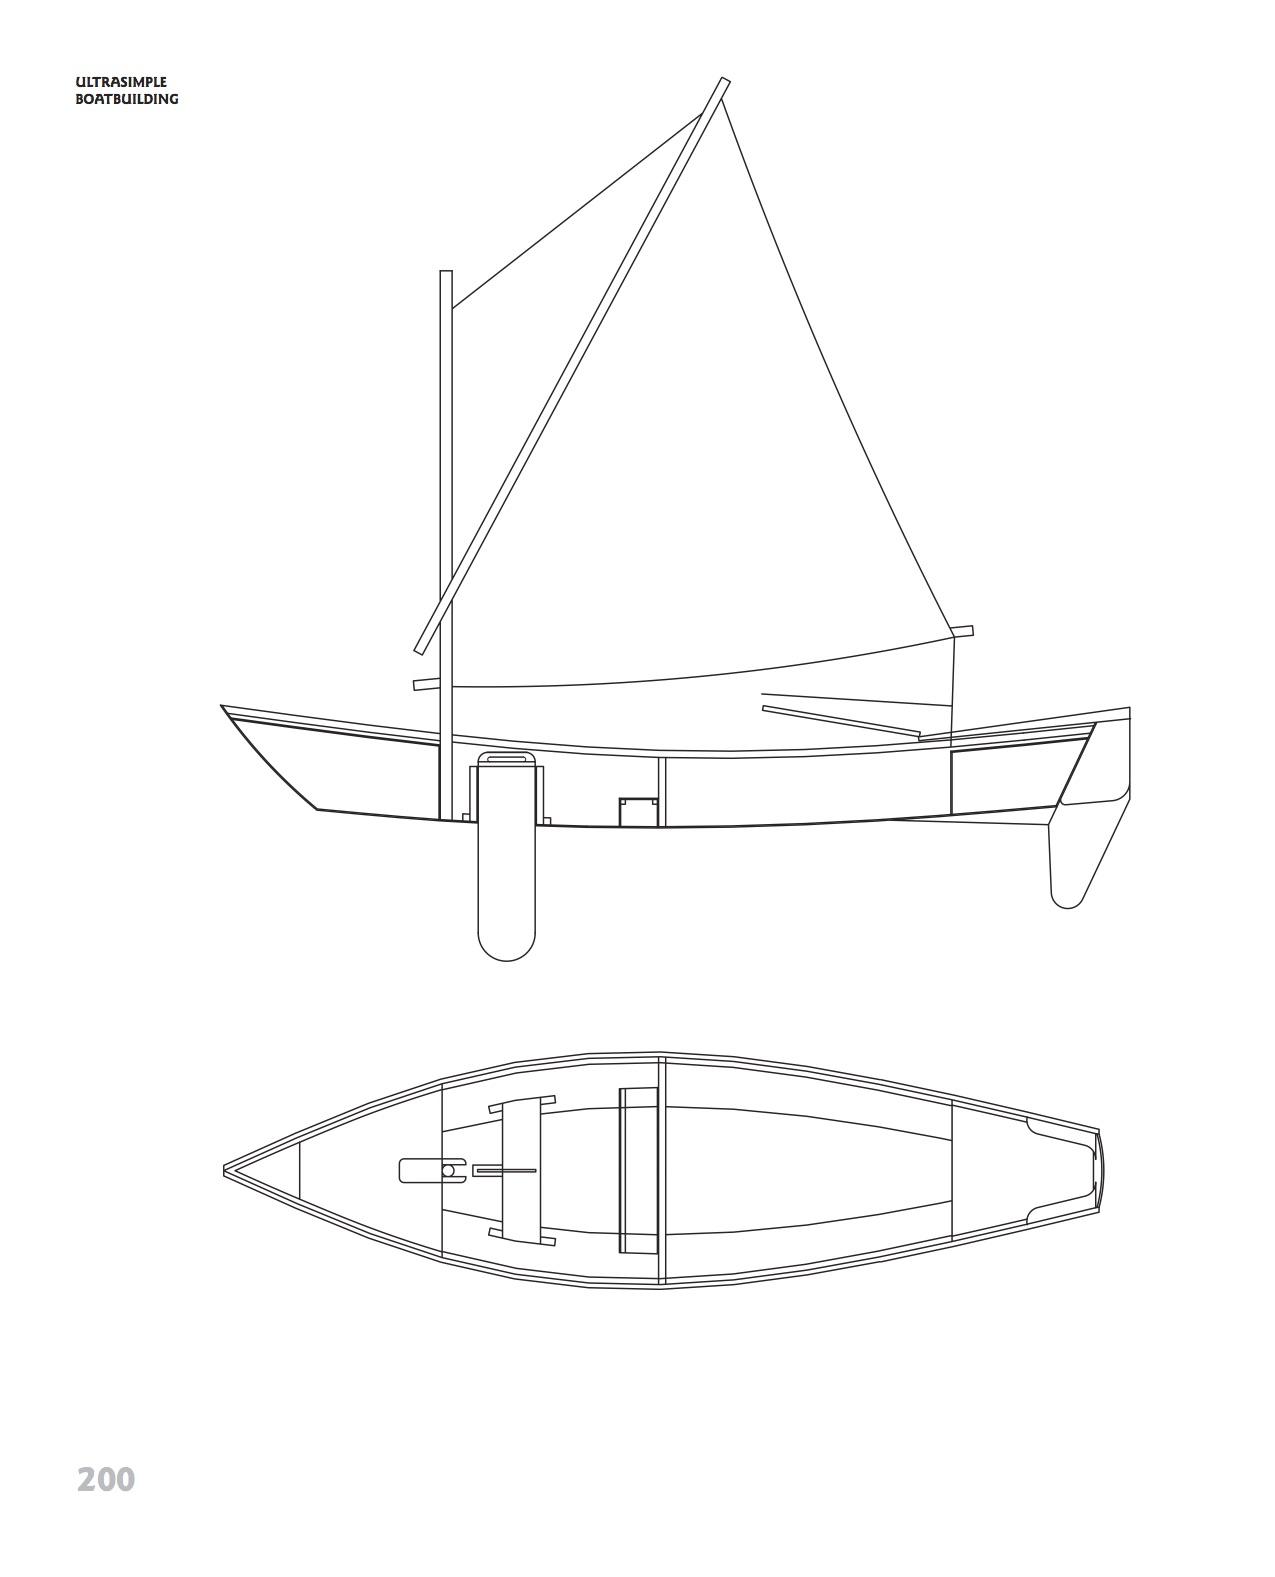 Ultrasimple,dinghy,Building,Can,Boats Ultrasimple Boat Building 17 Plywood Boats Anyone Can Build  114959v2jrkx7lhkwixoi6